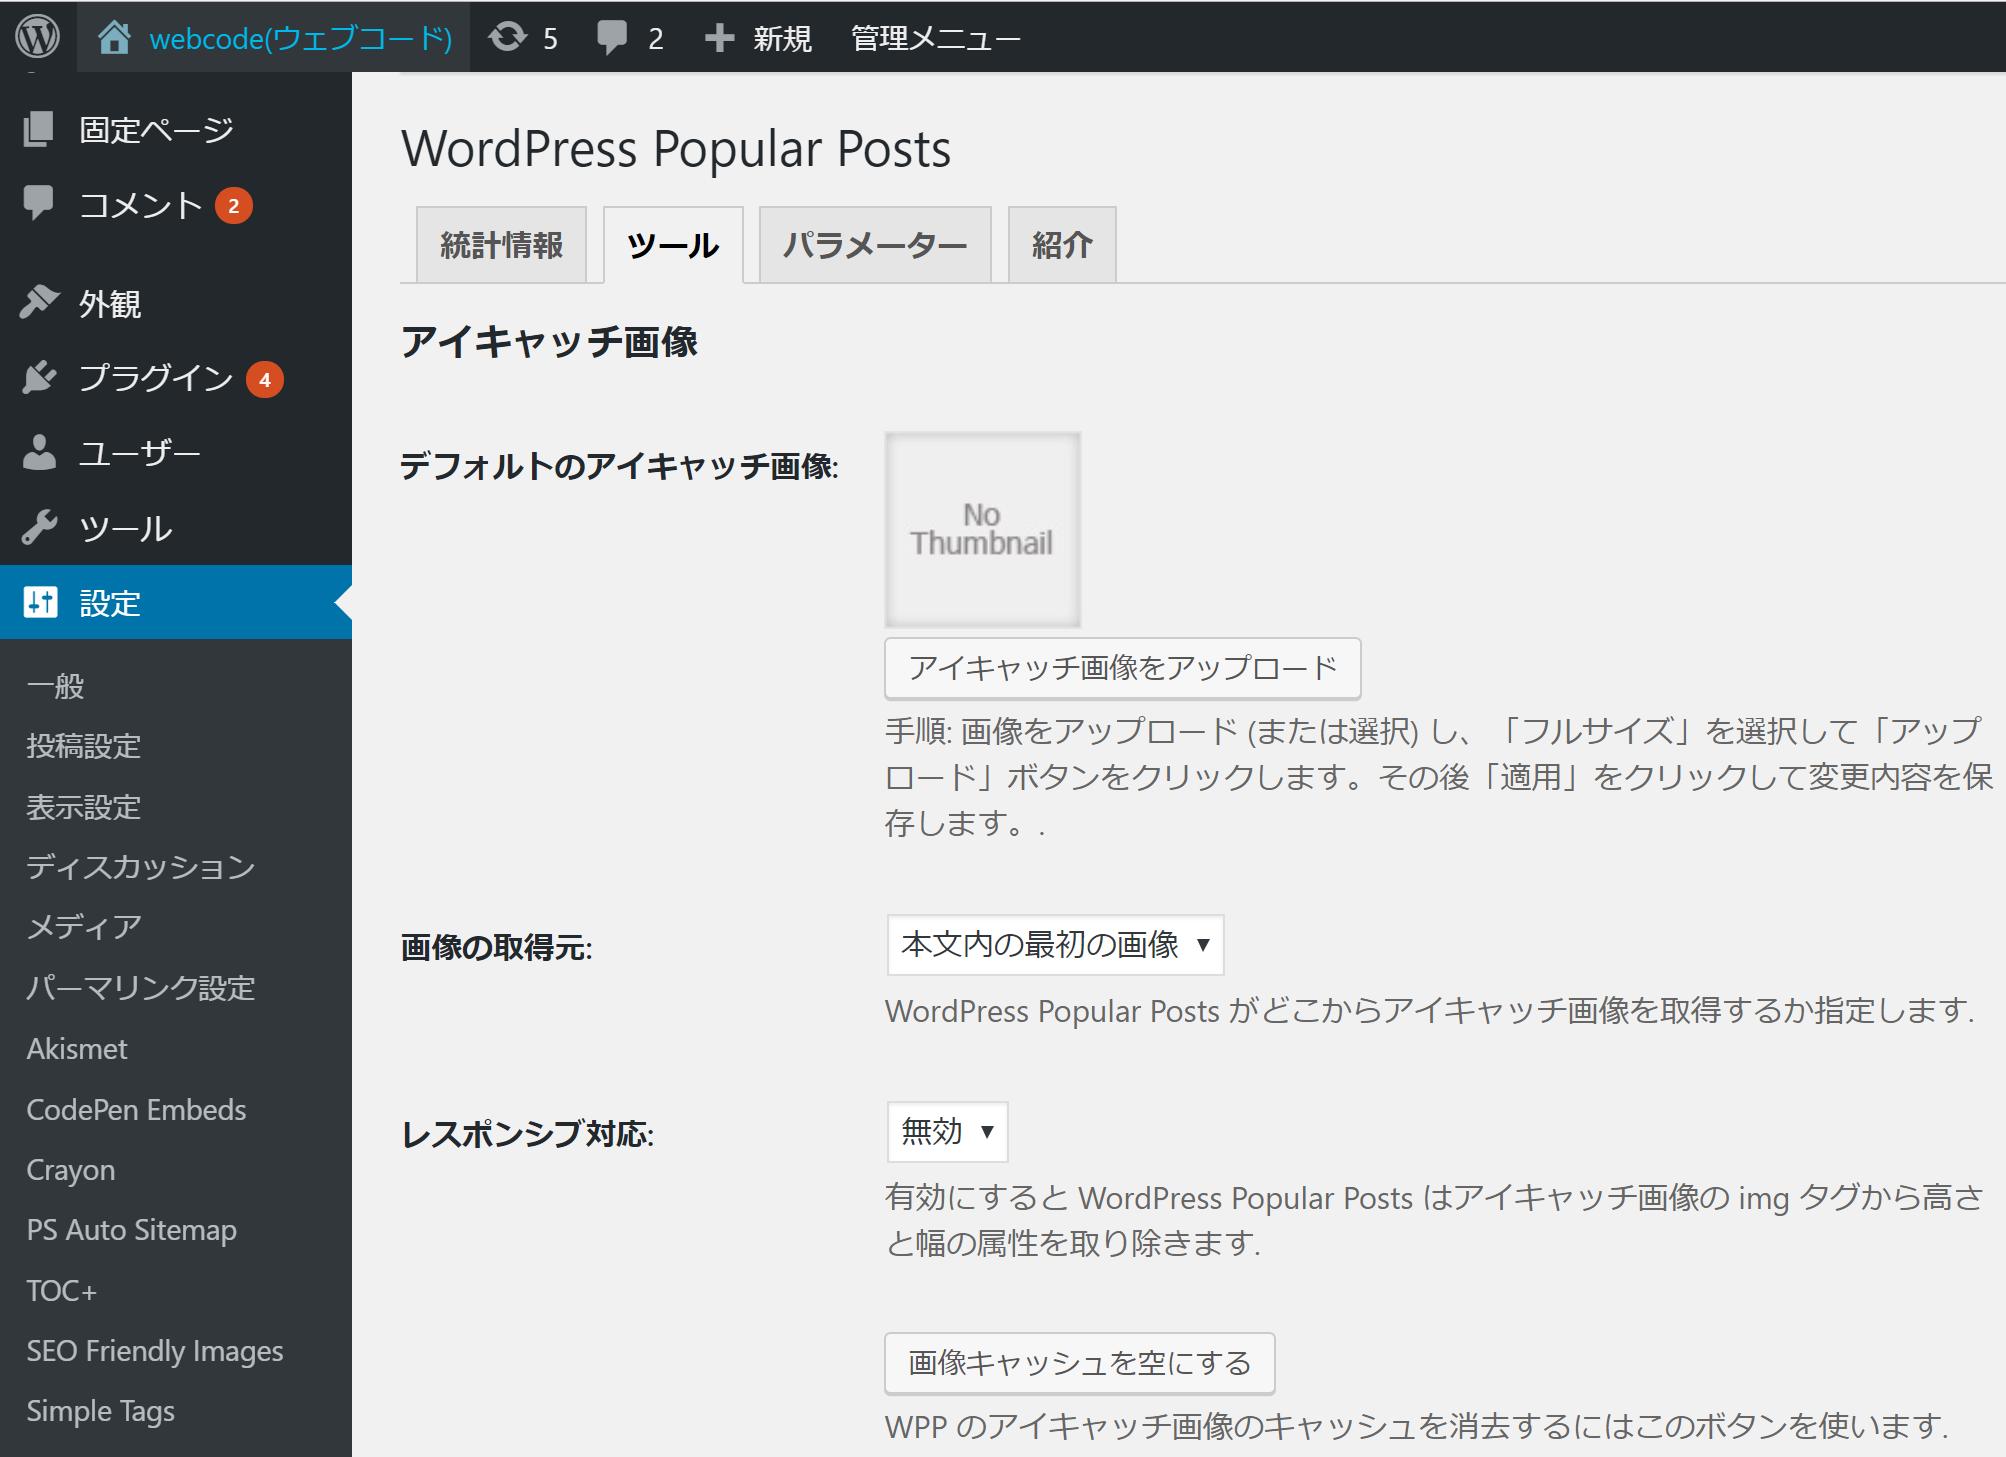 wpp cash - WordPress Popular Postsの設定やカスタマイズの方法まとめ!人気記事をランキング形式で表示